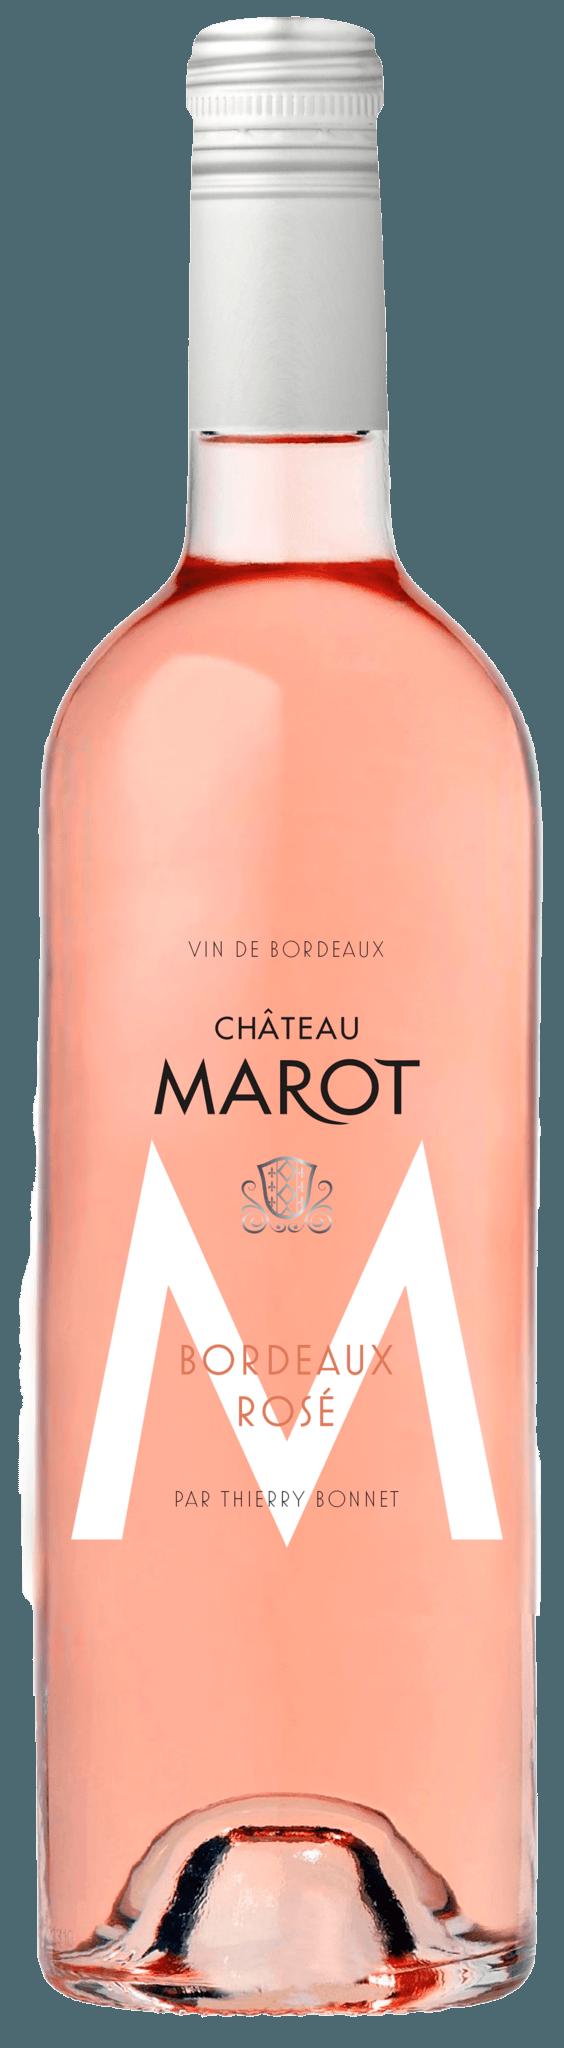 Château Marot